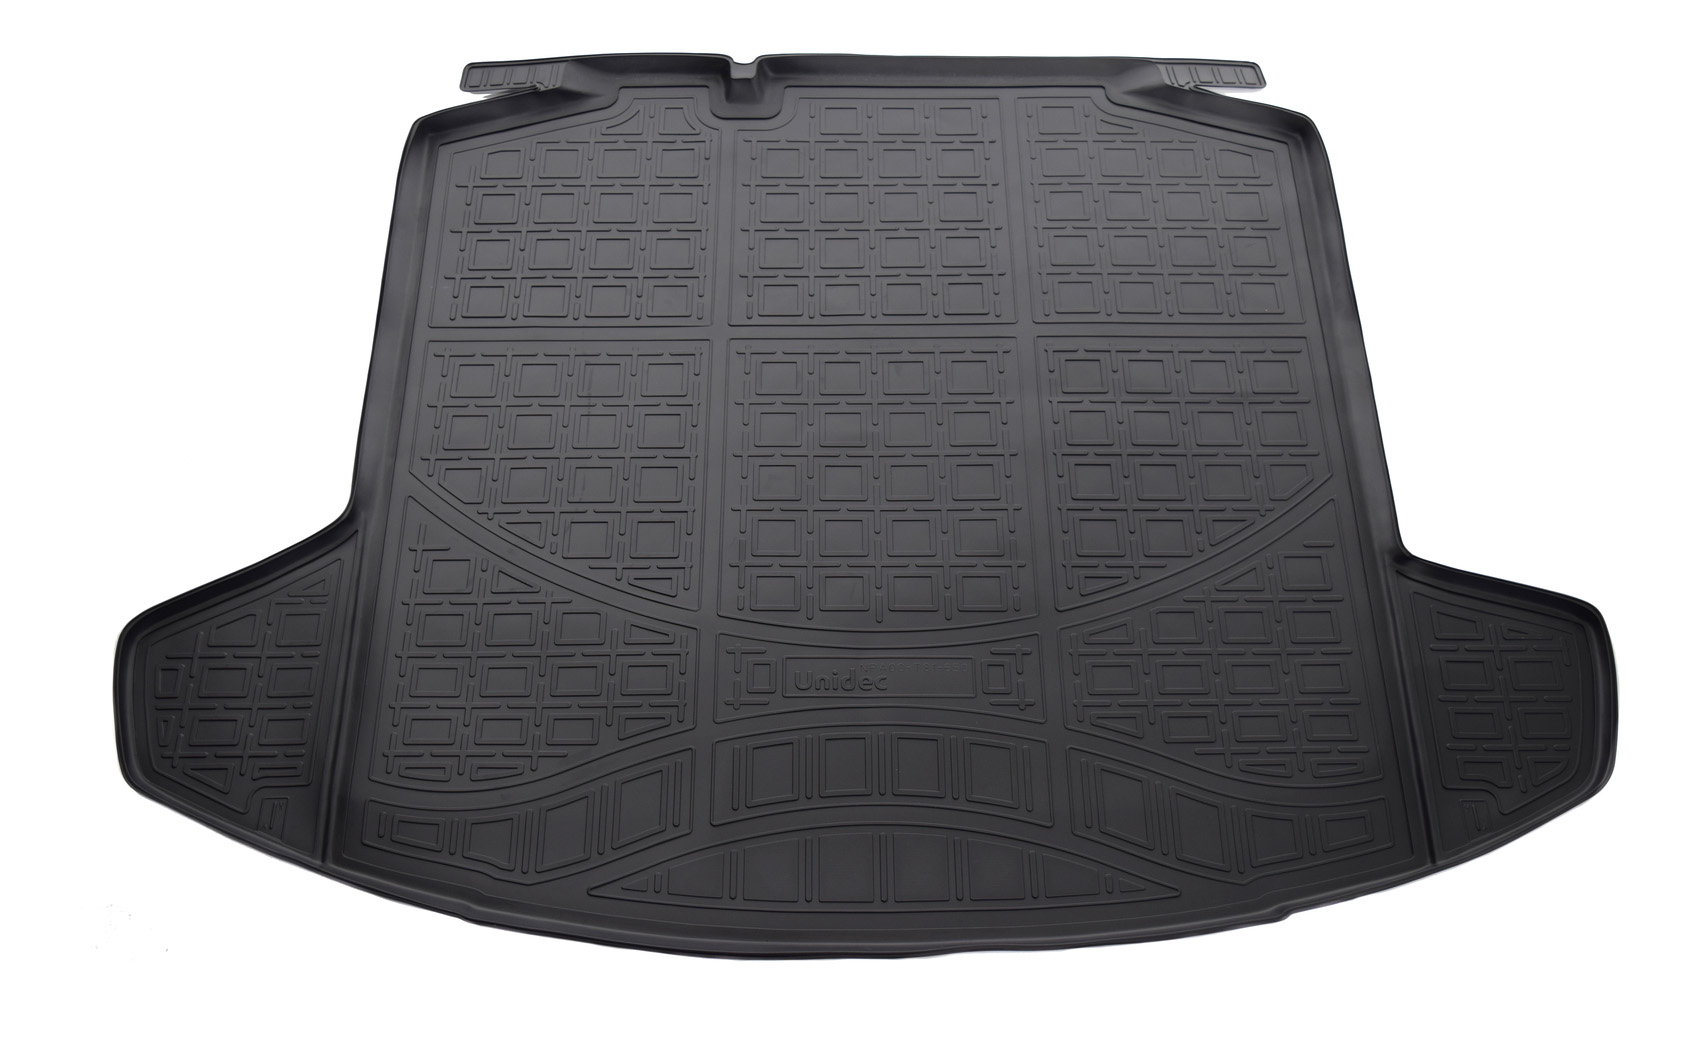 Коврик в багажник автомобиля для Skoda Norplast (NPA00-T81-650) фото